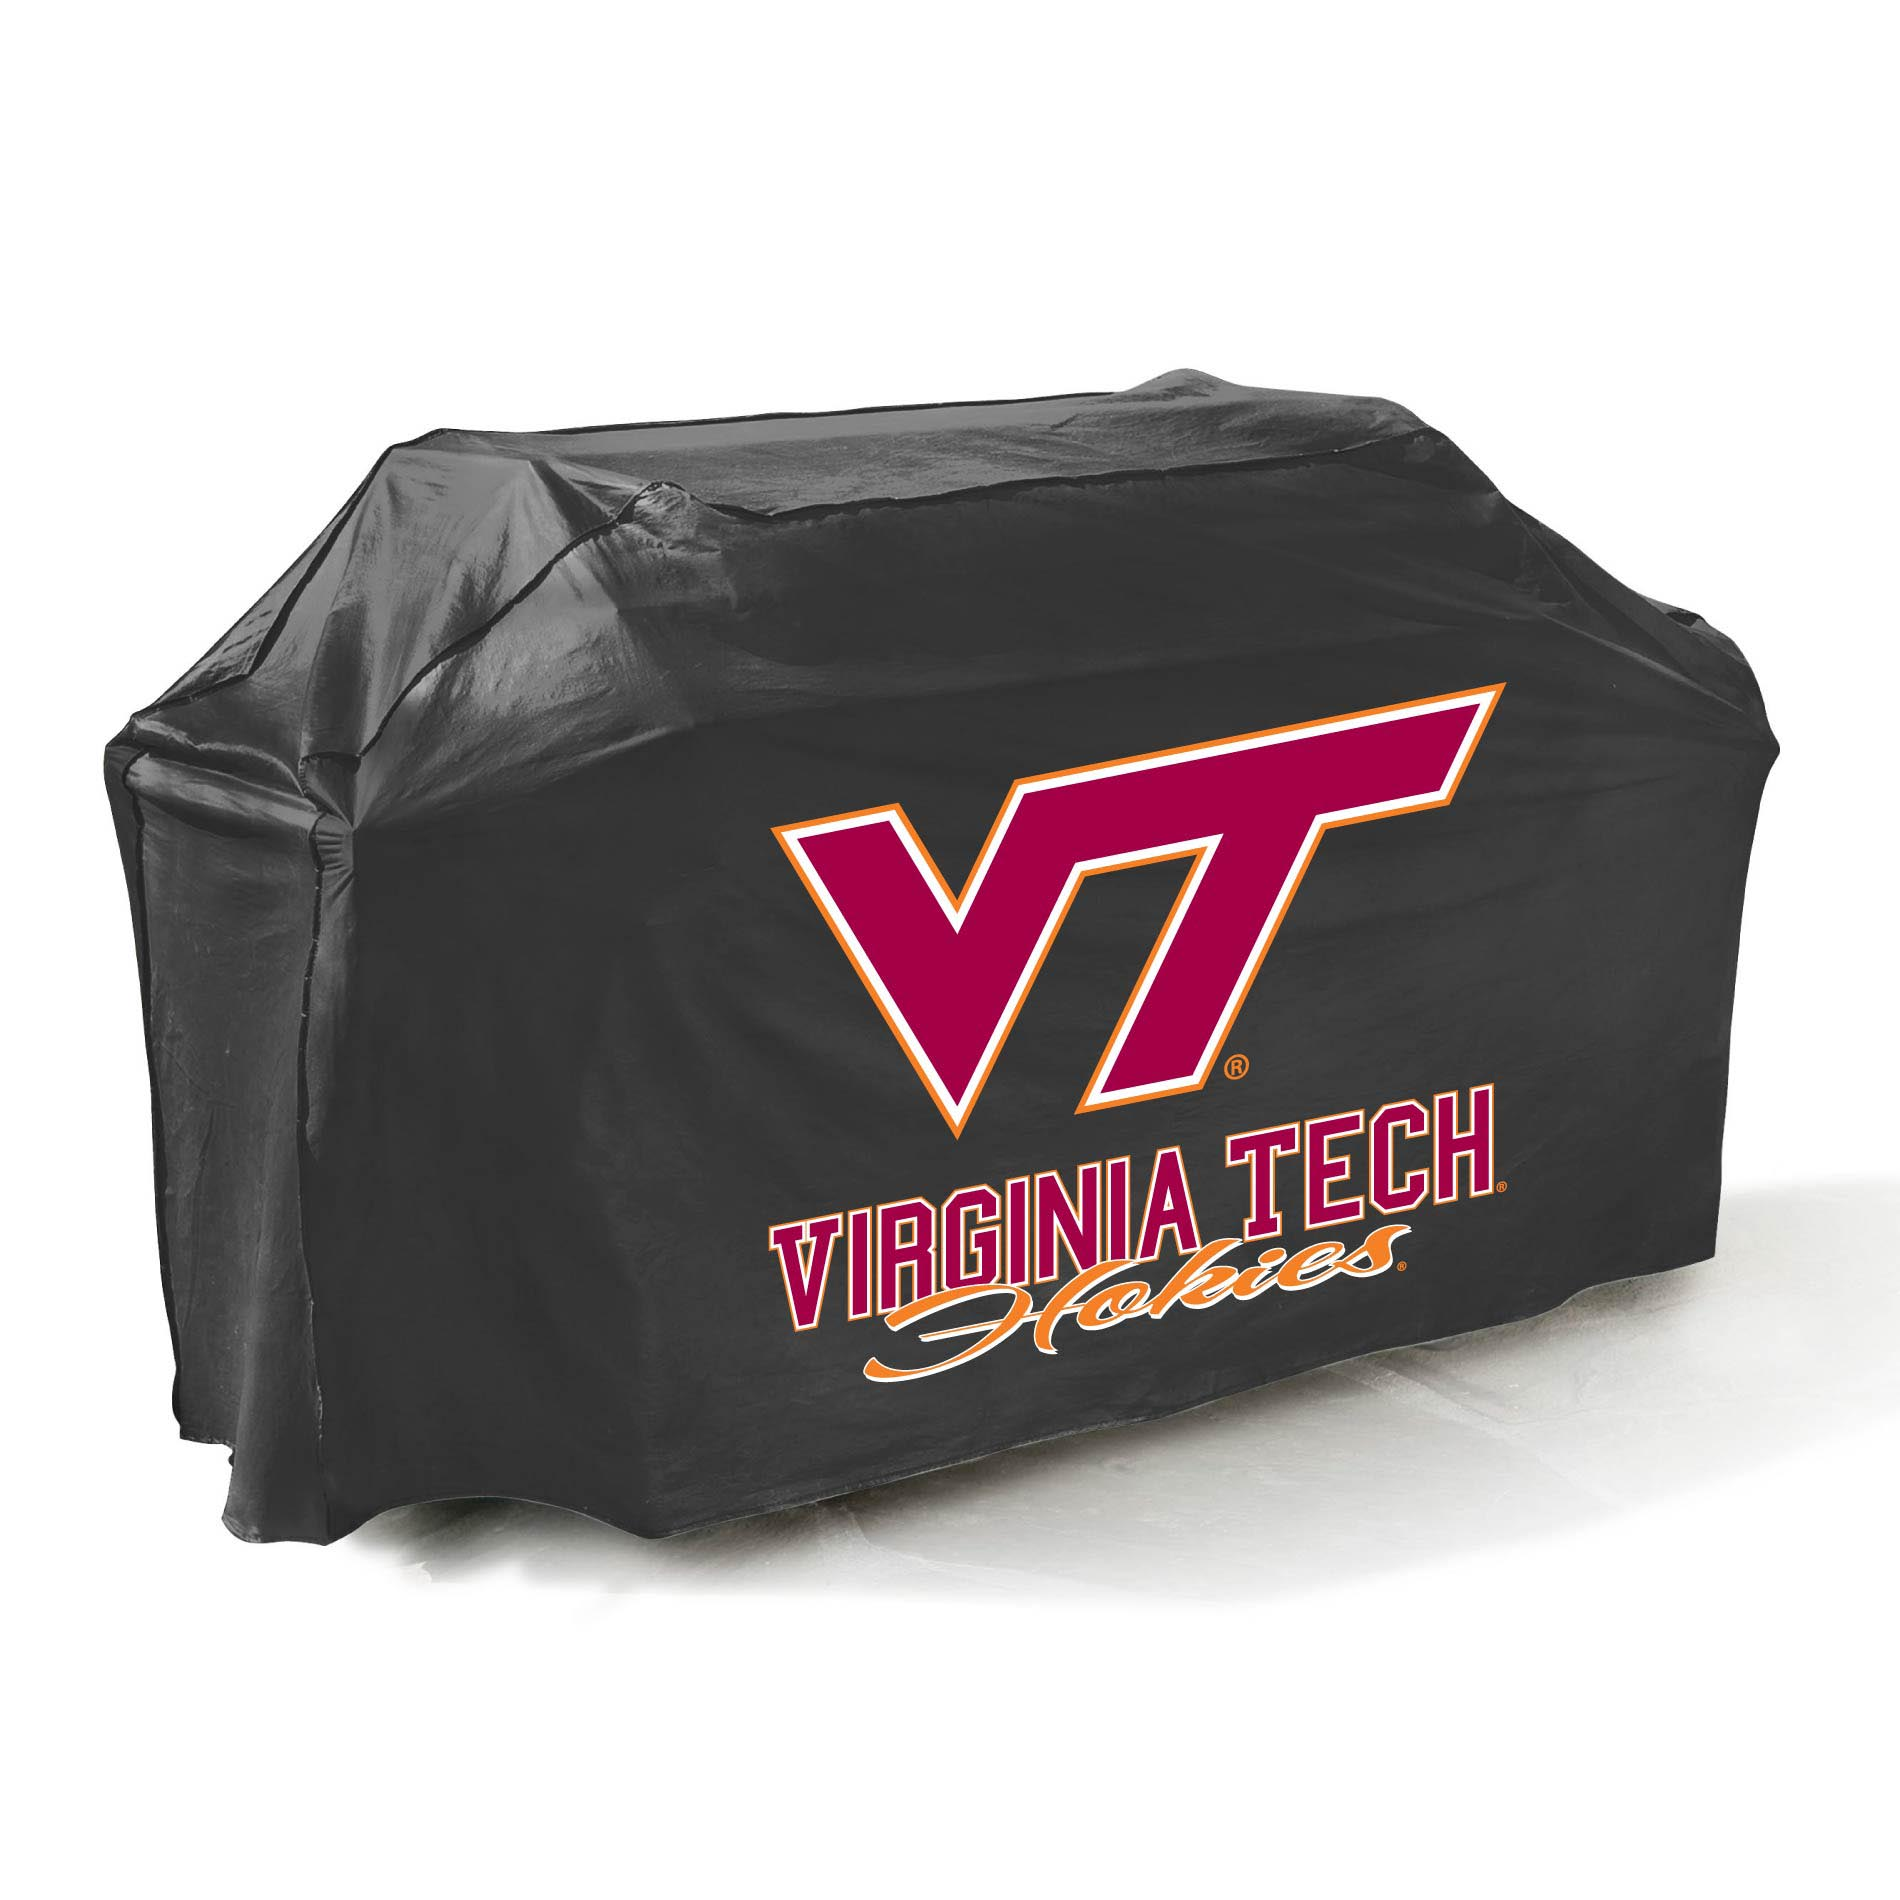 Virginia Tech Hokies 65-inch Gas Grill Cover